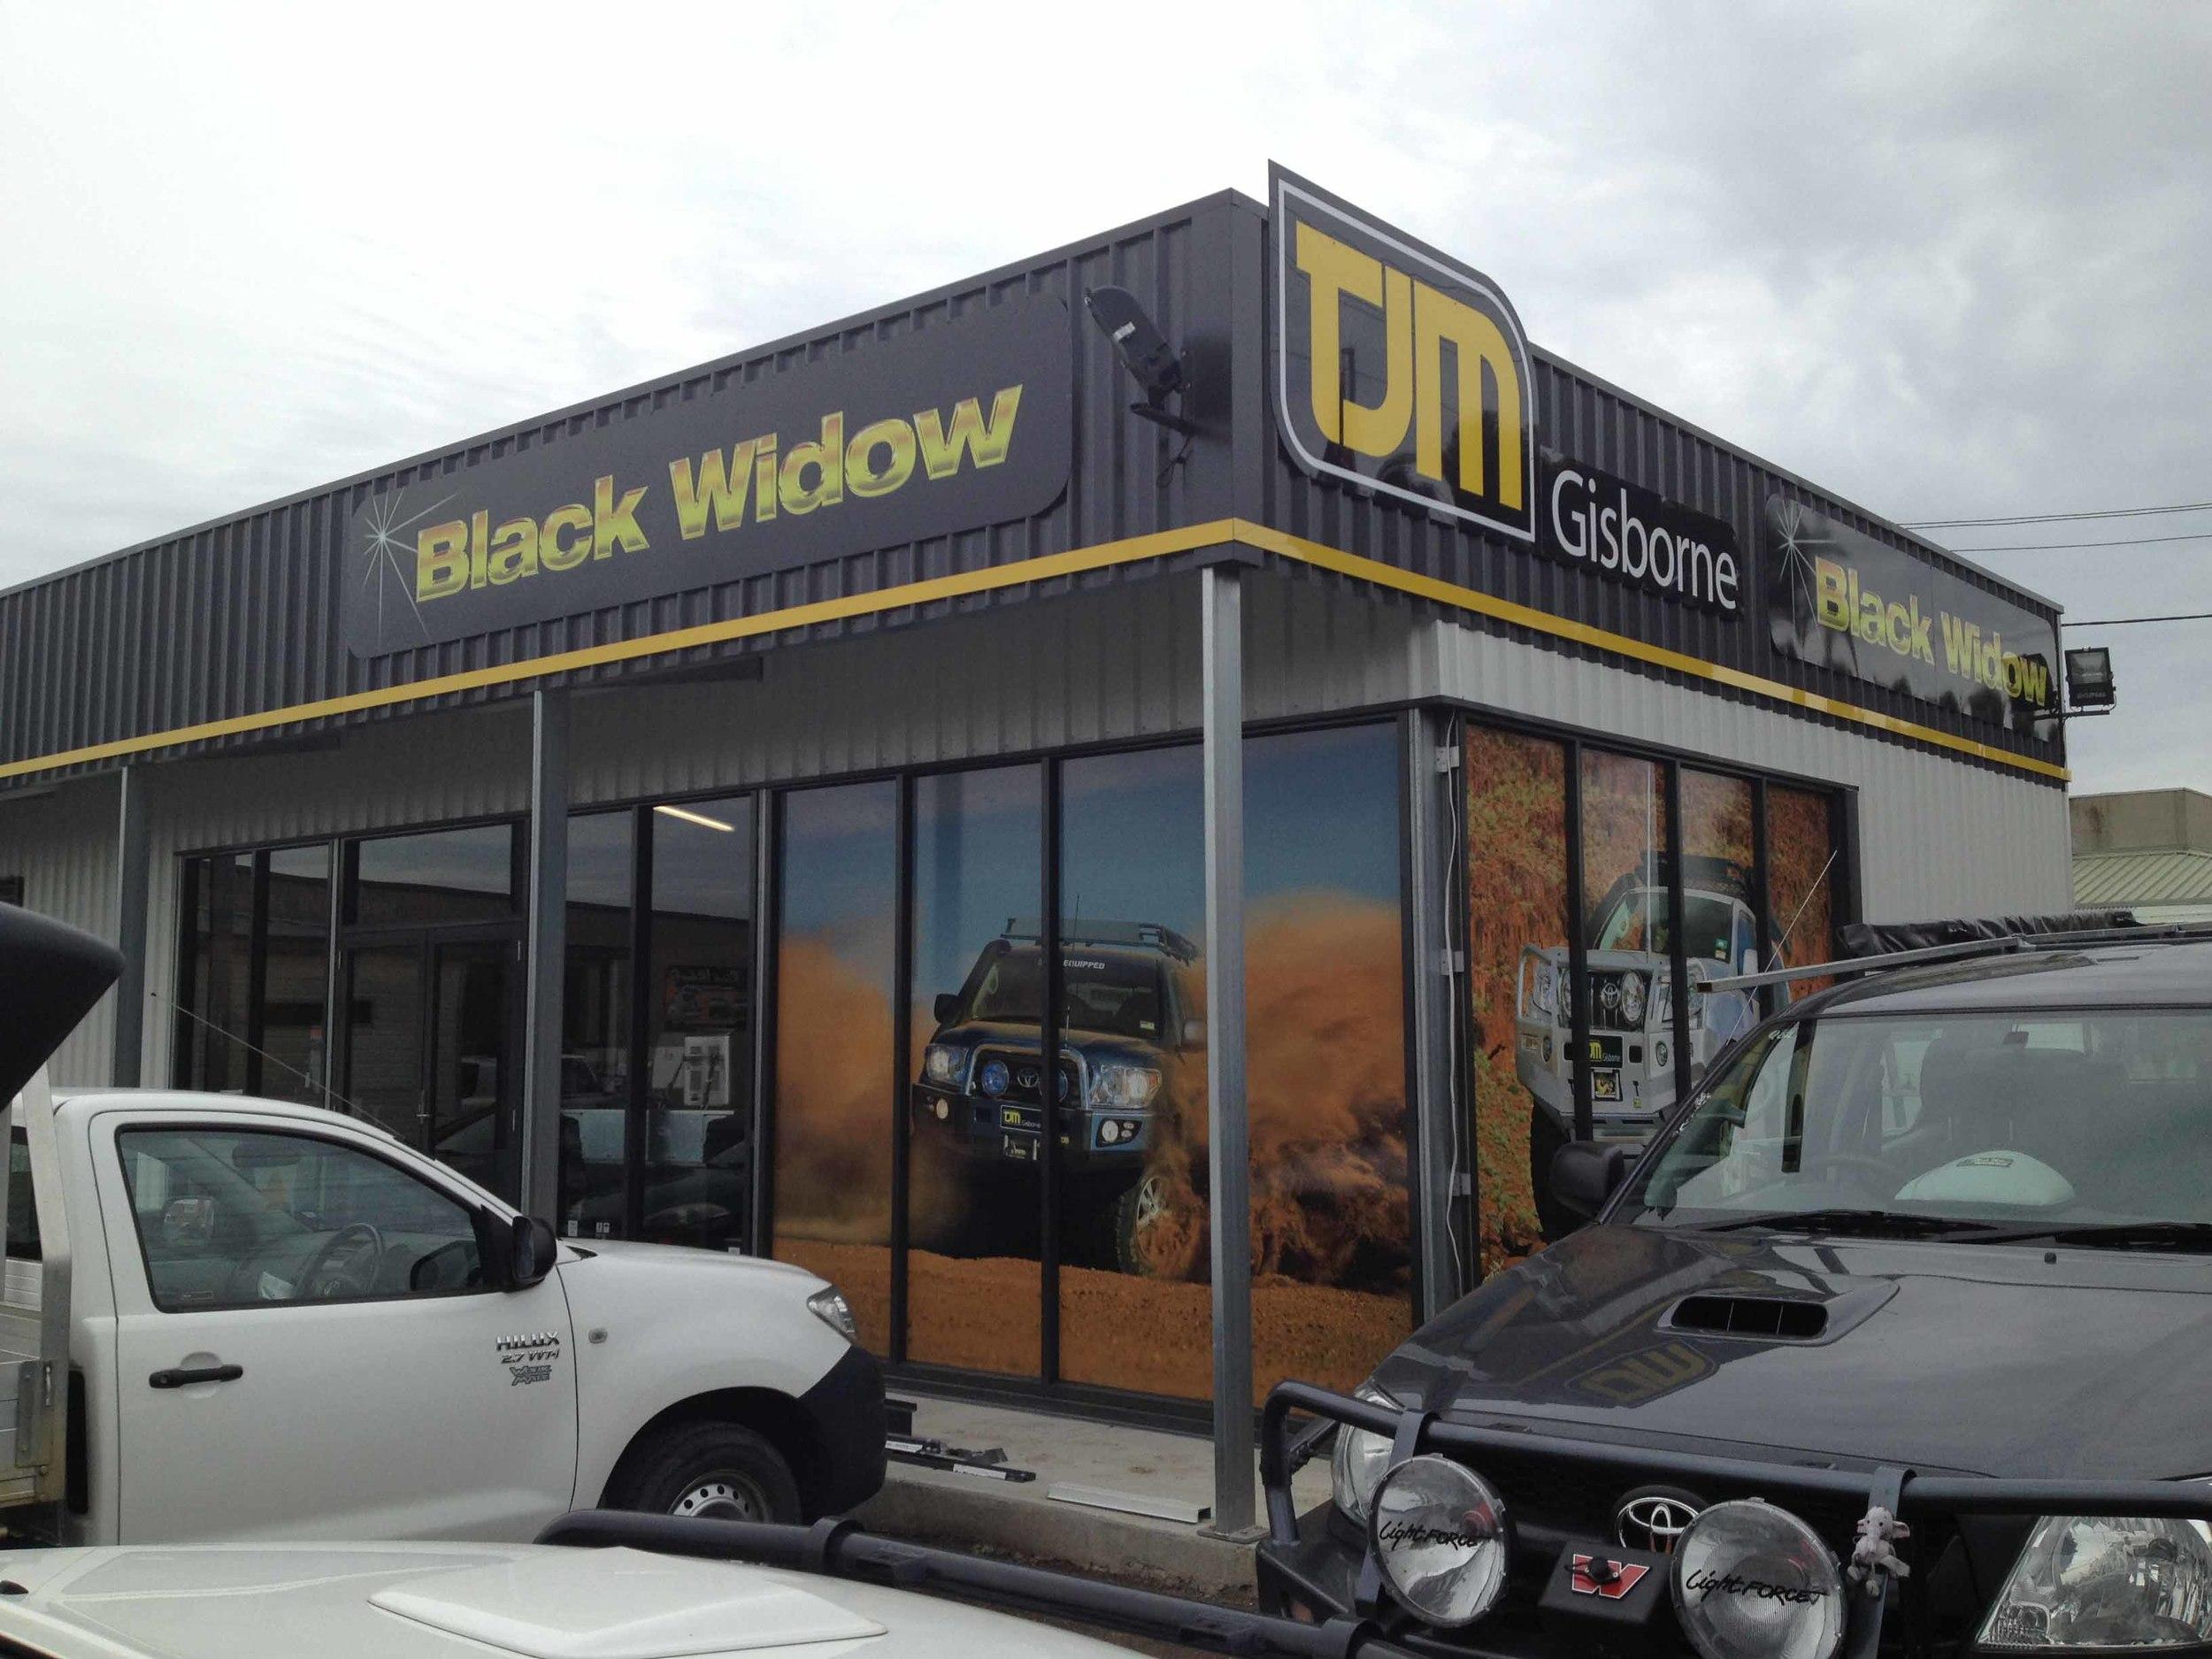 TJM Black Widow Gisborne 2 Signs Geelong.jpg